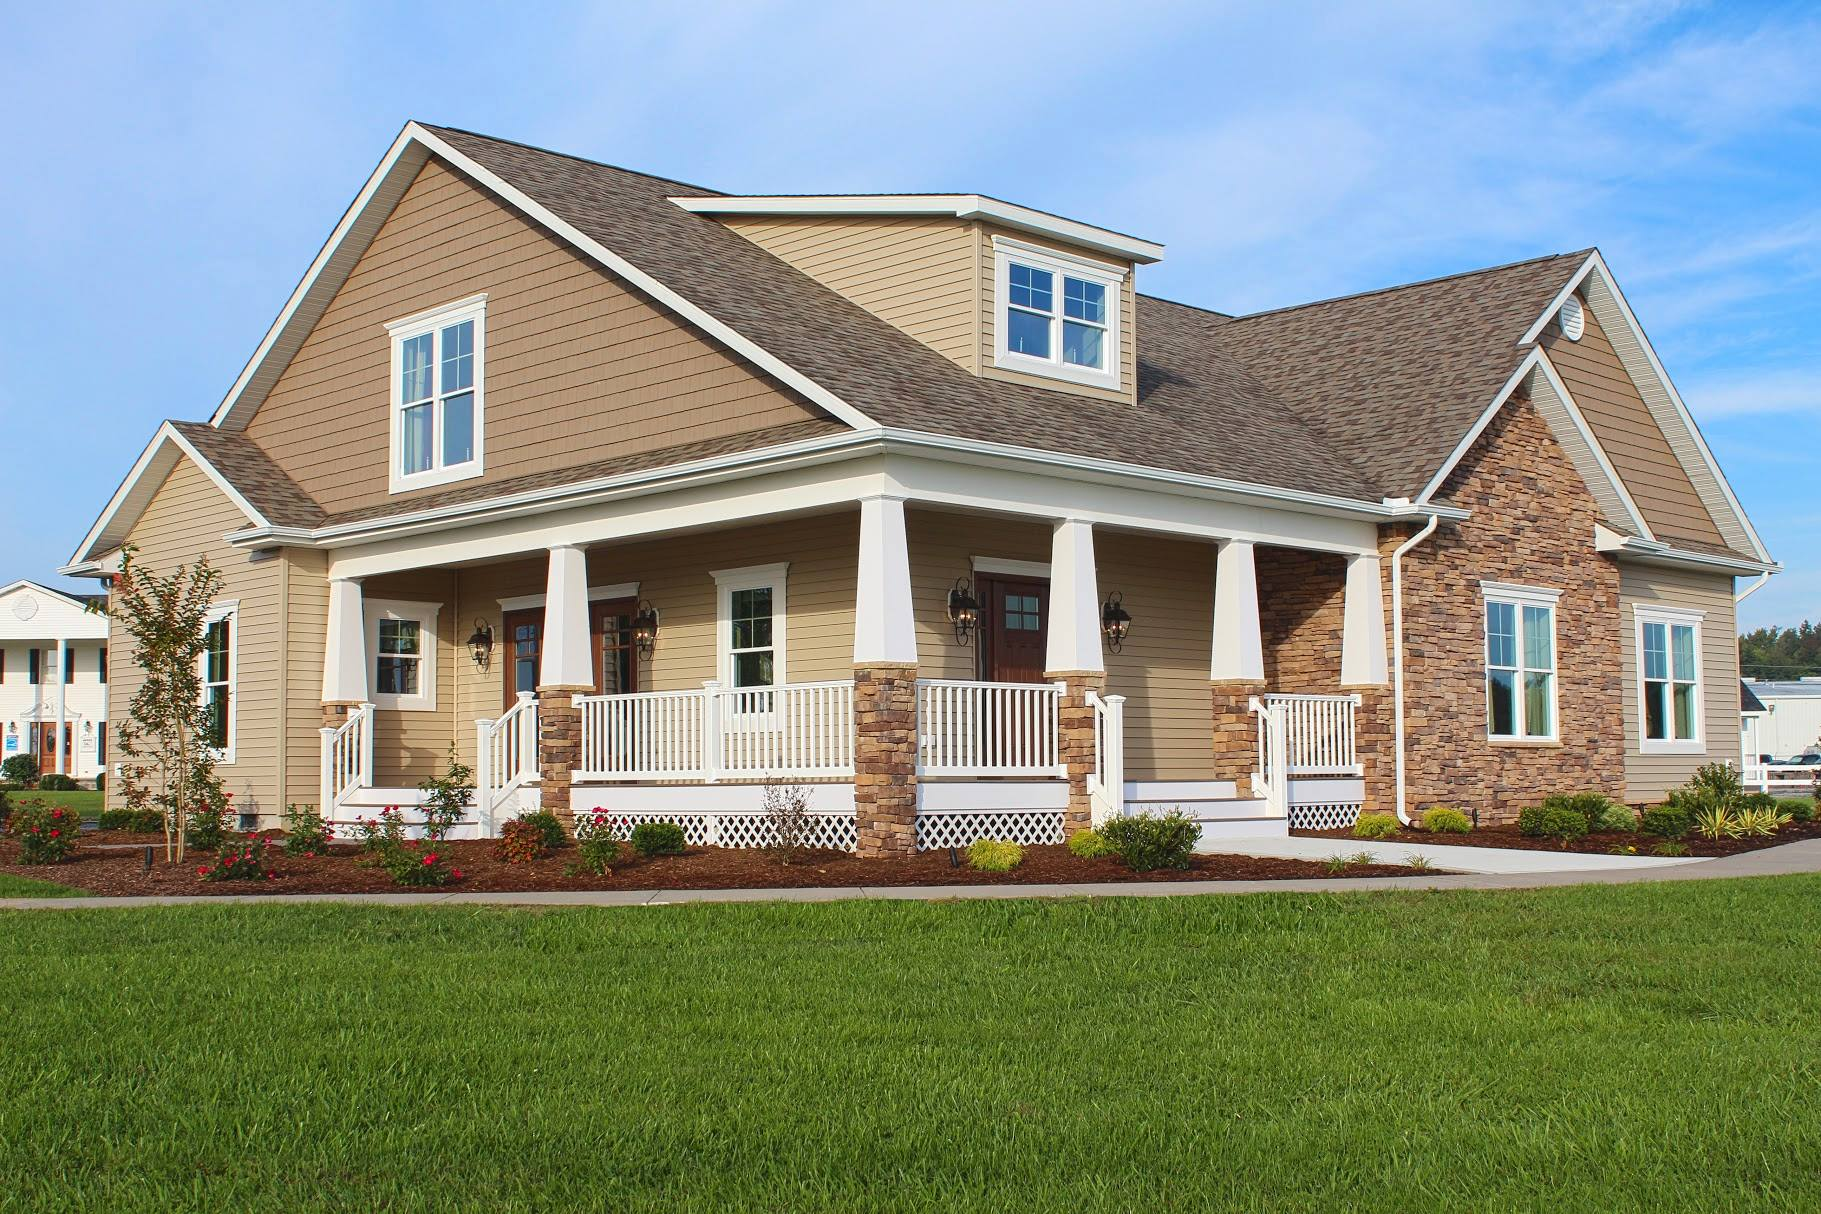 Custom Modular Homes and Manufactured Homes  ModularHomescom